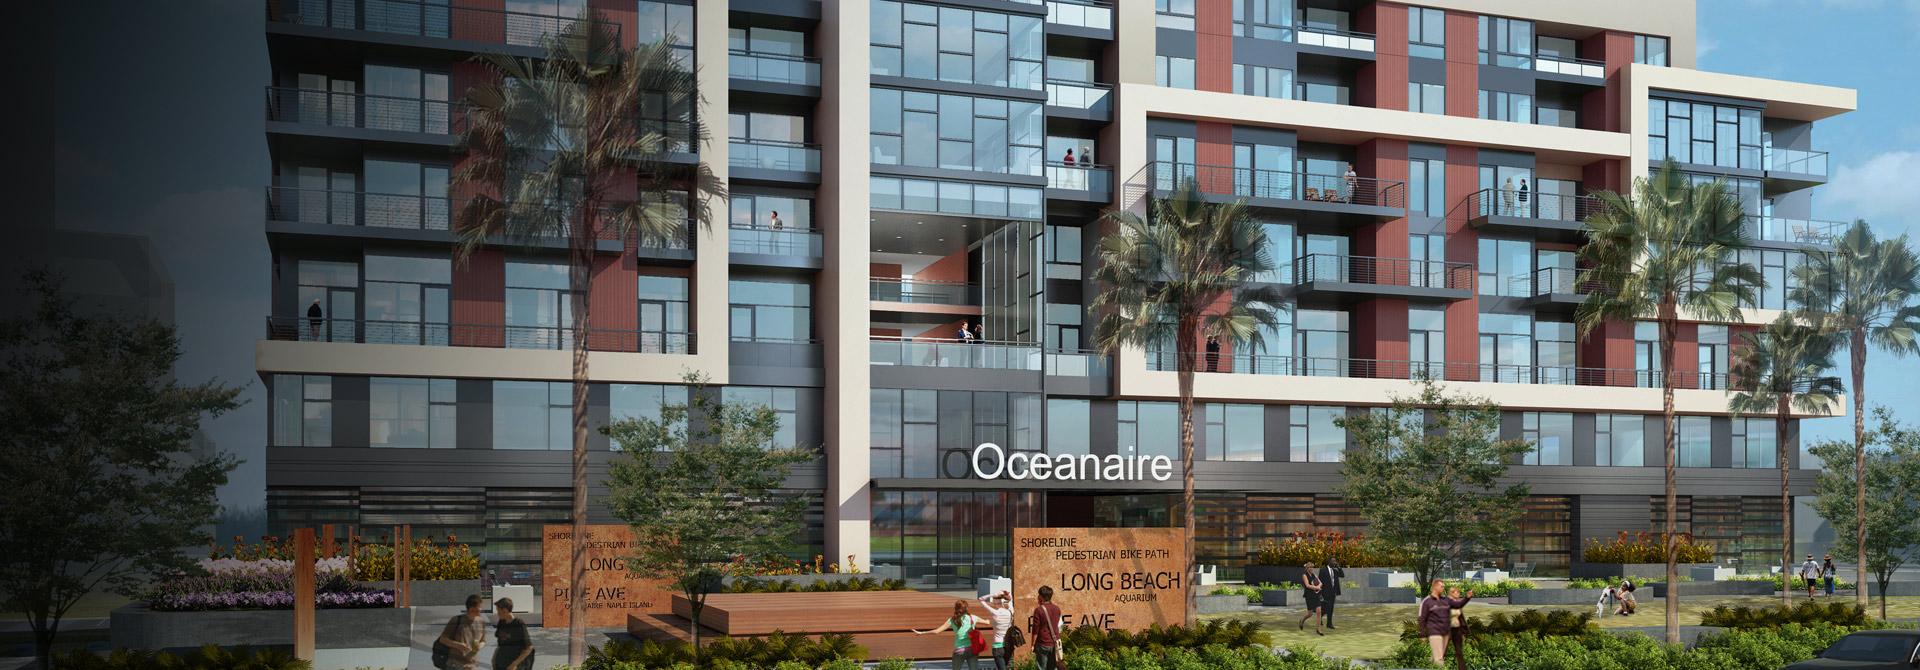 Oceanaire Apartments banner